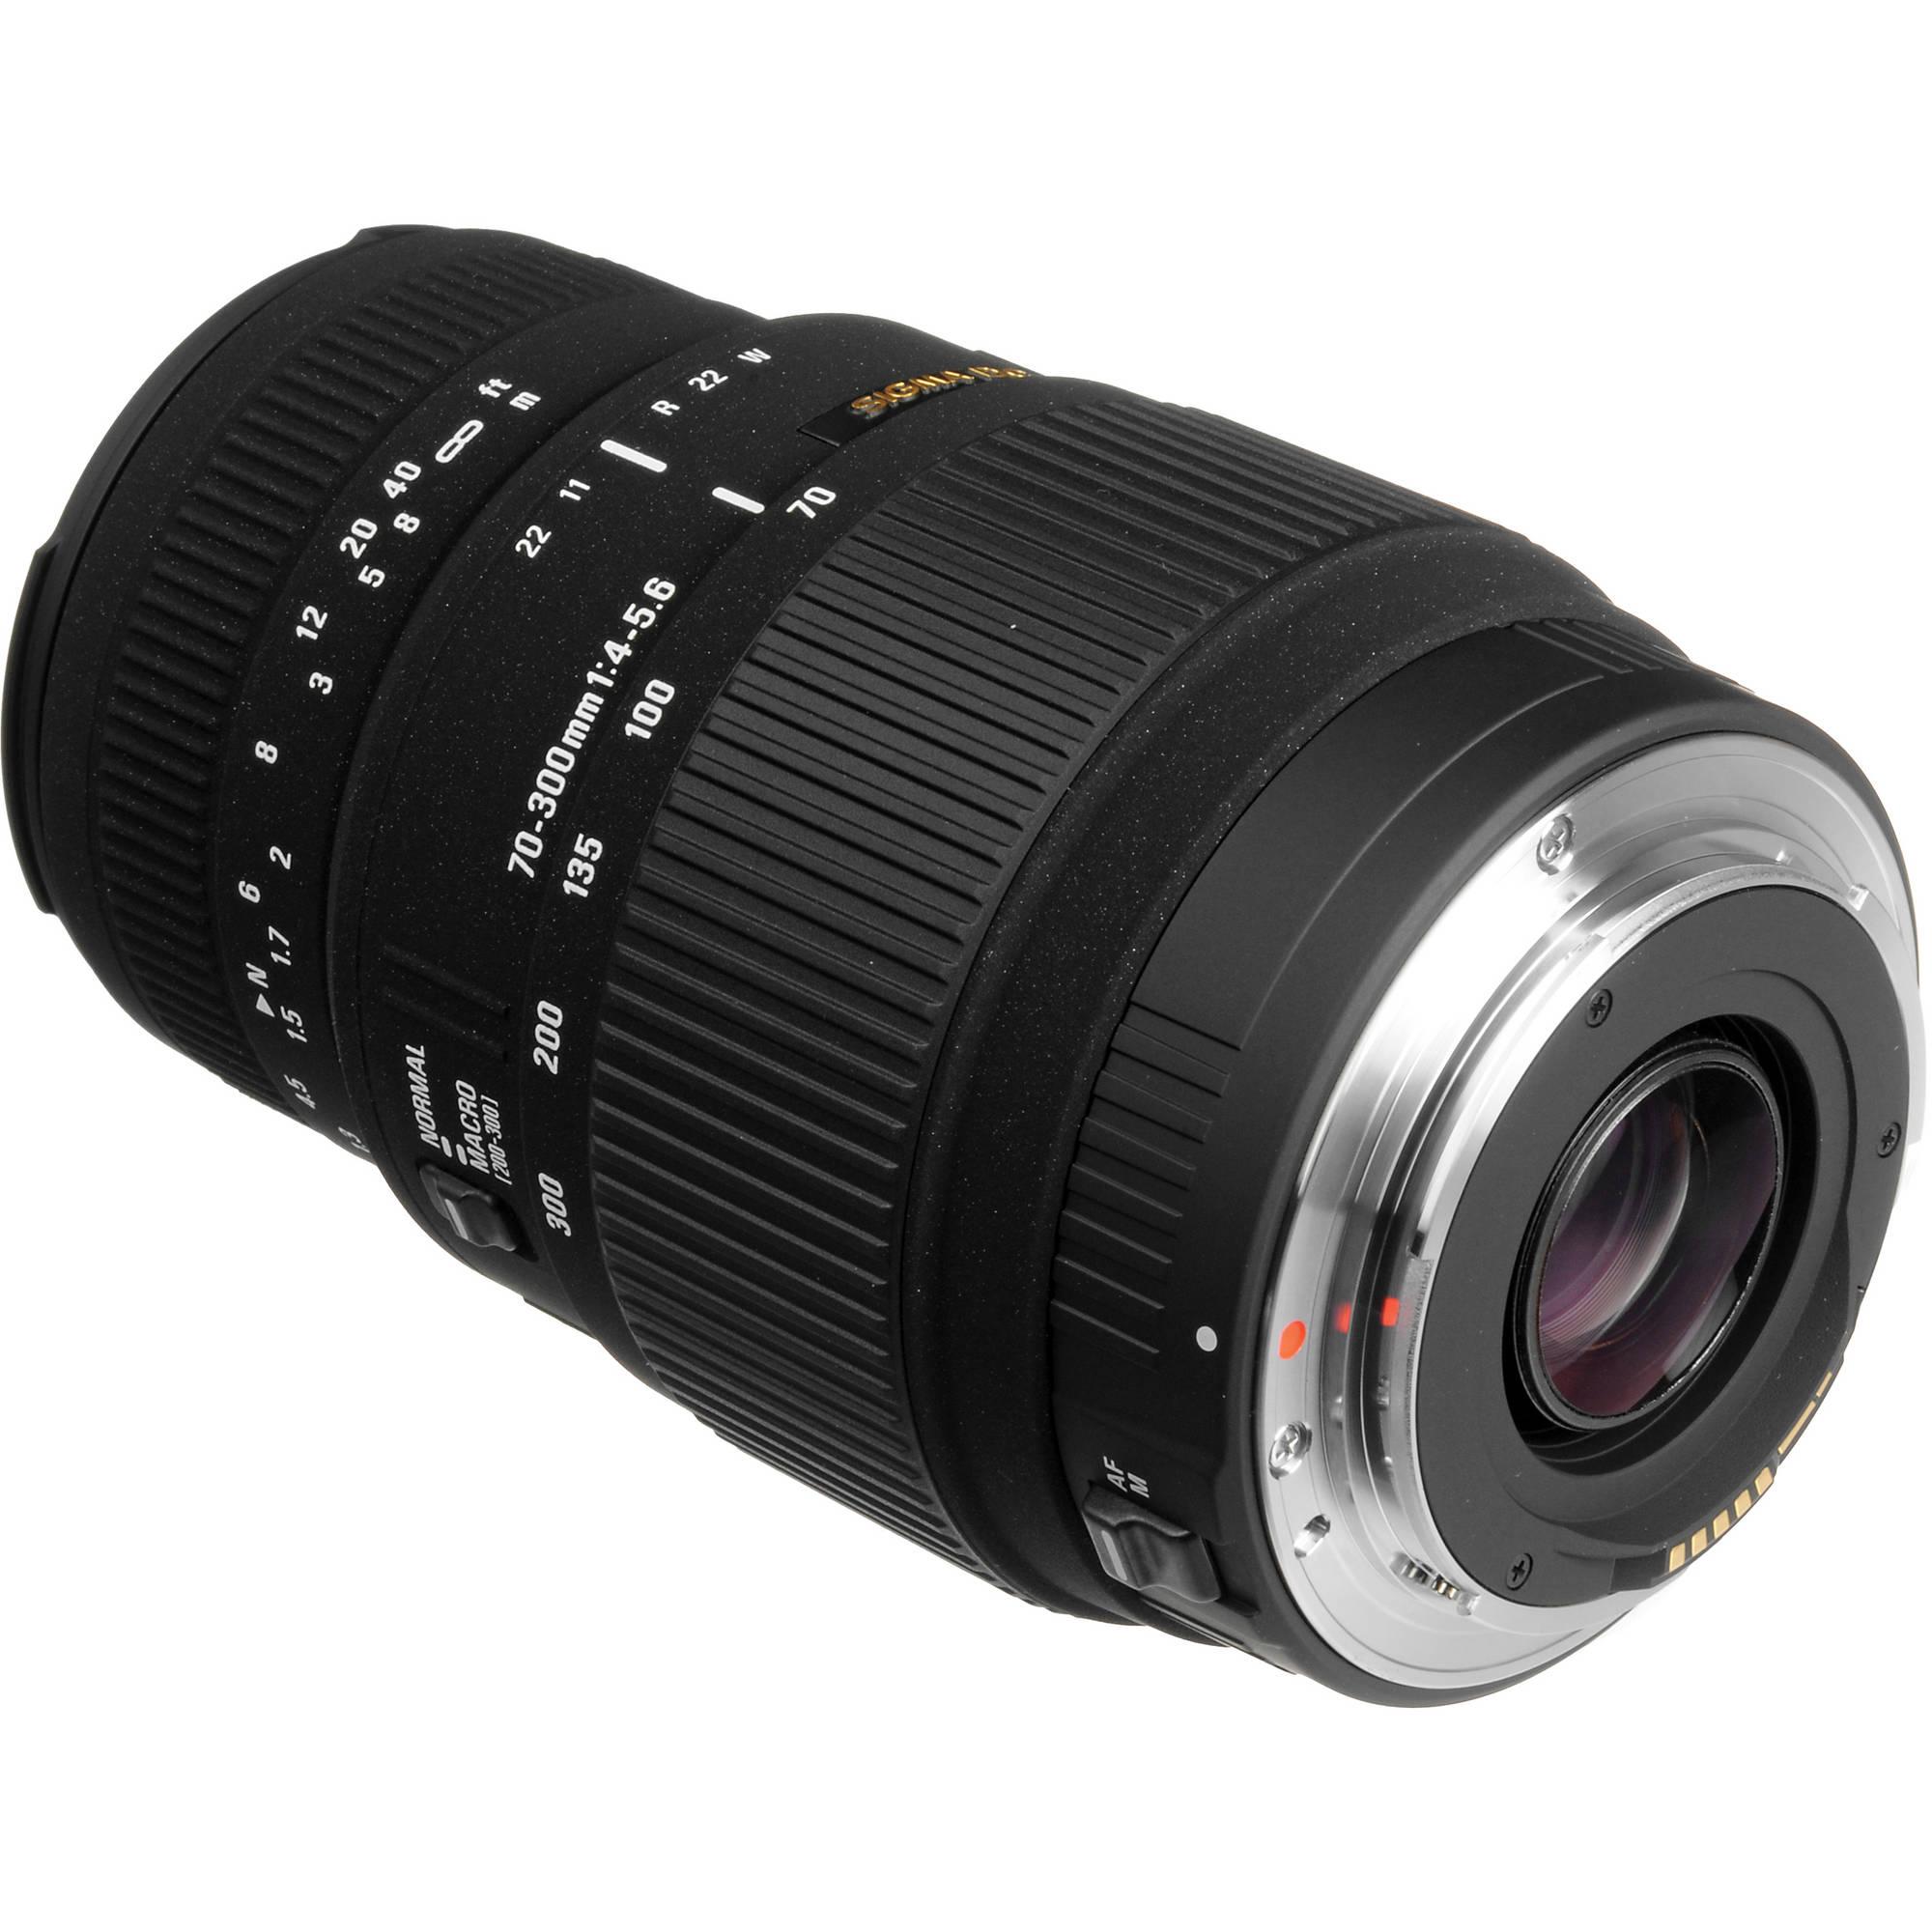 Sigma 70-300mm f/4-5 6 DG Macro Lens for Canon EOS